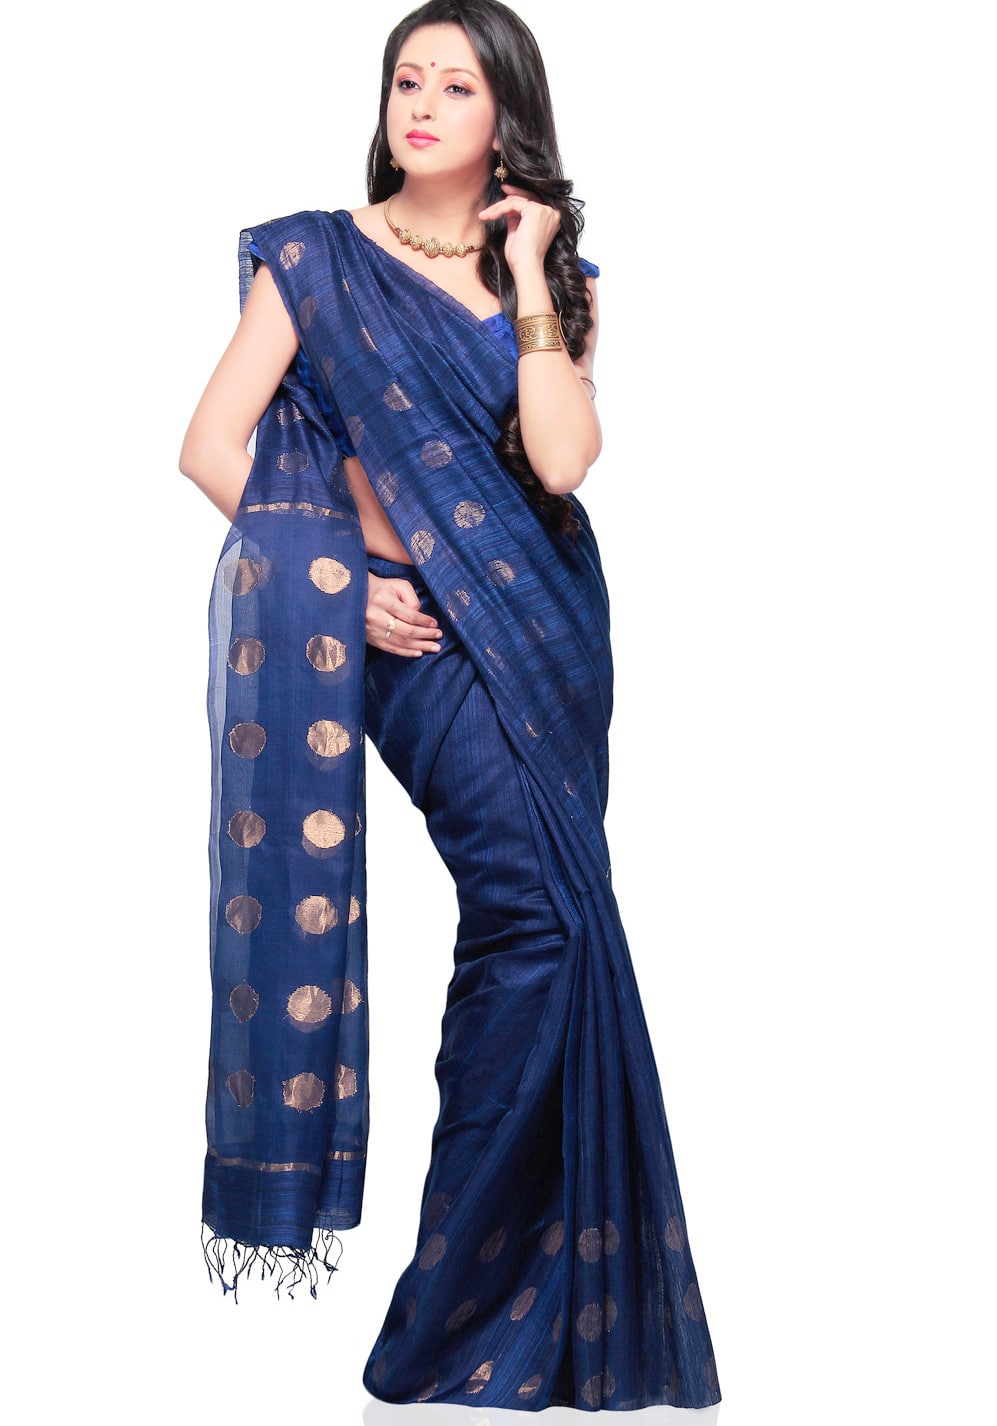 Handloom Saree Image